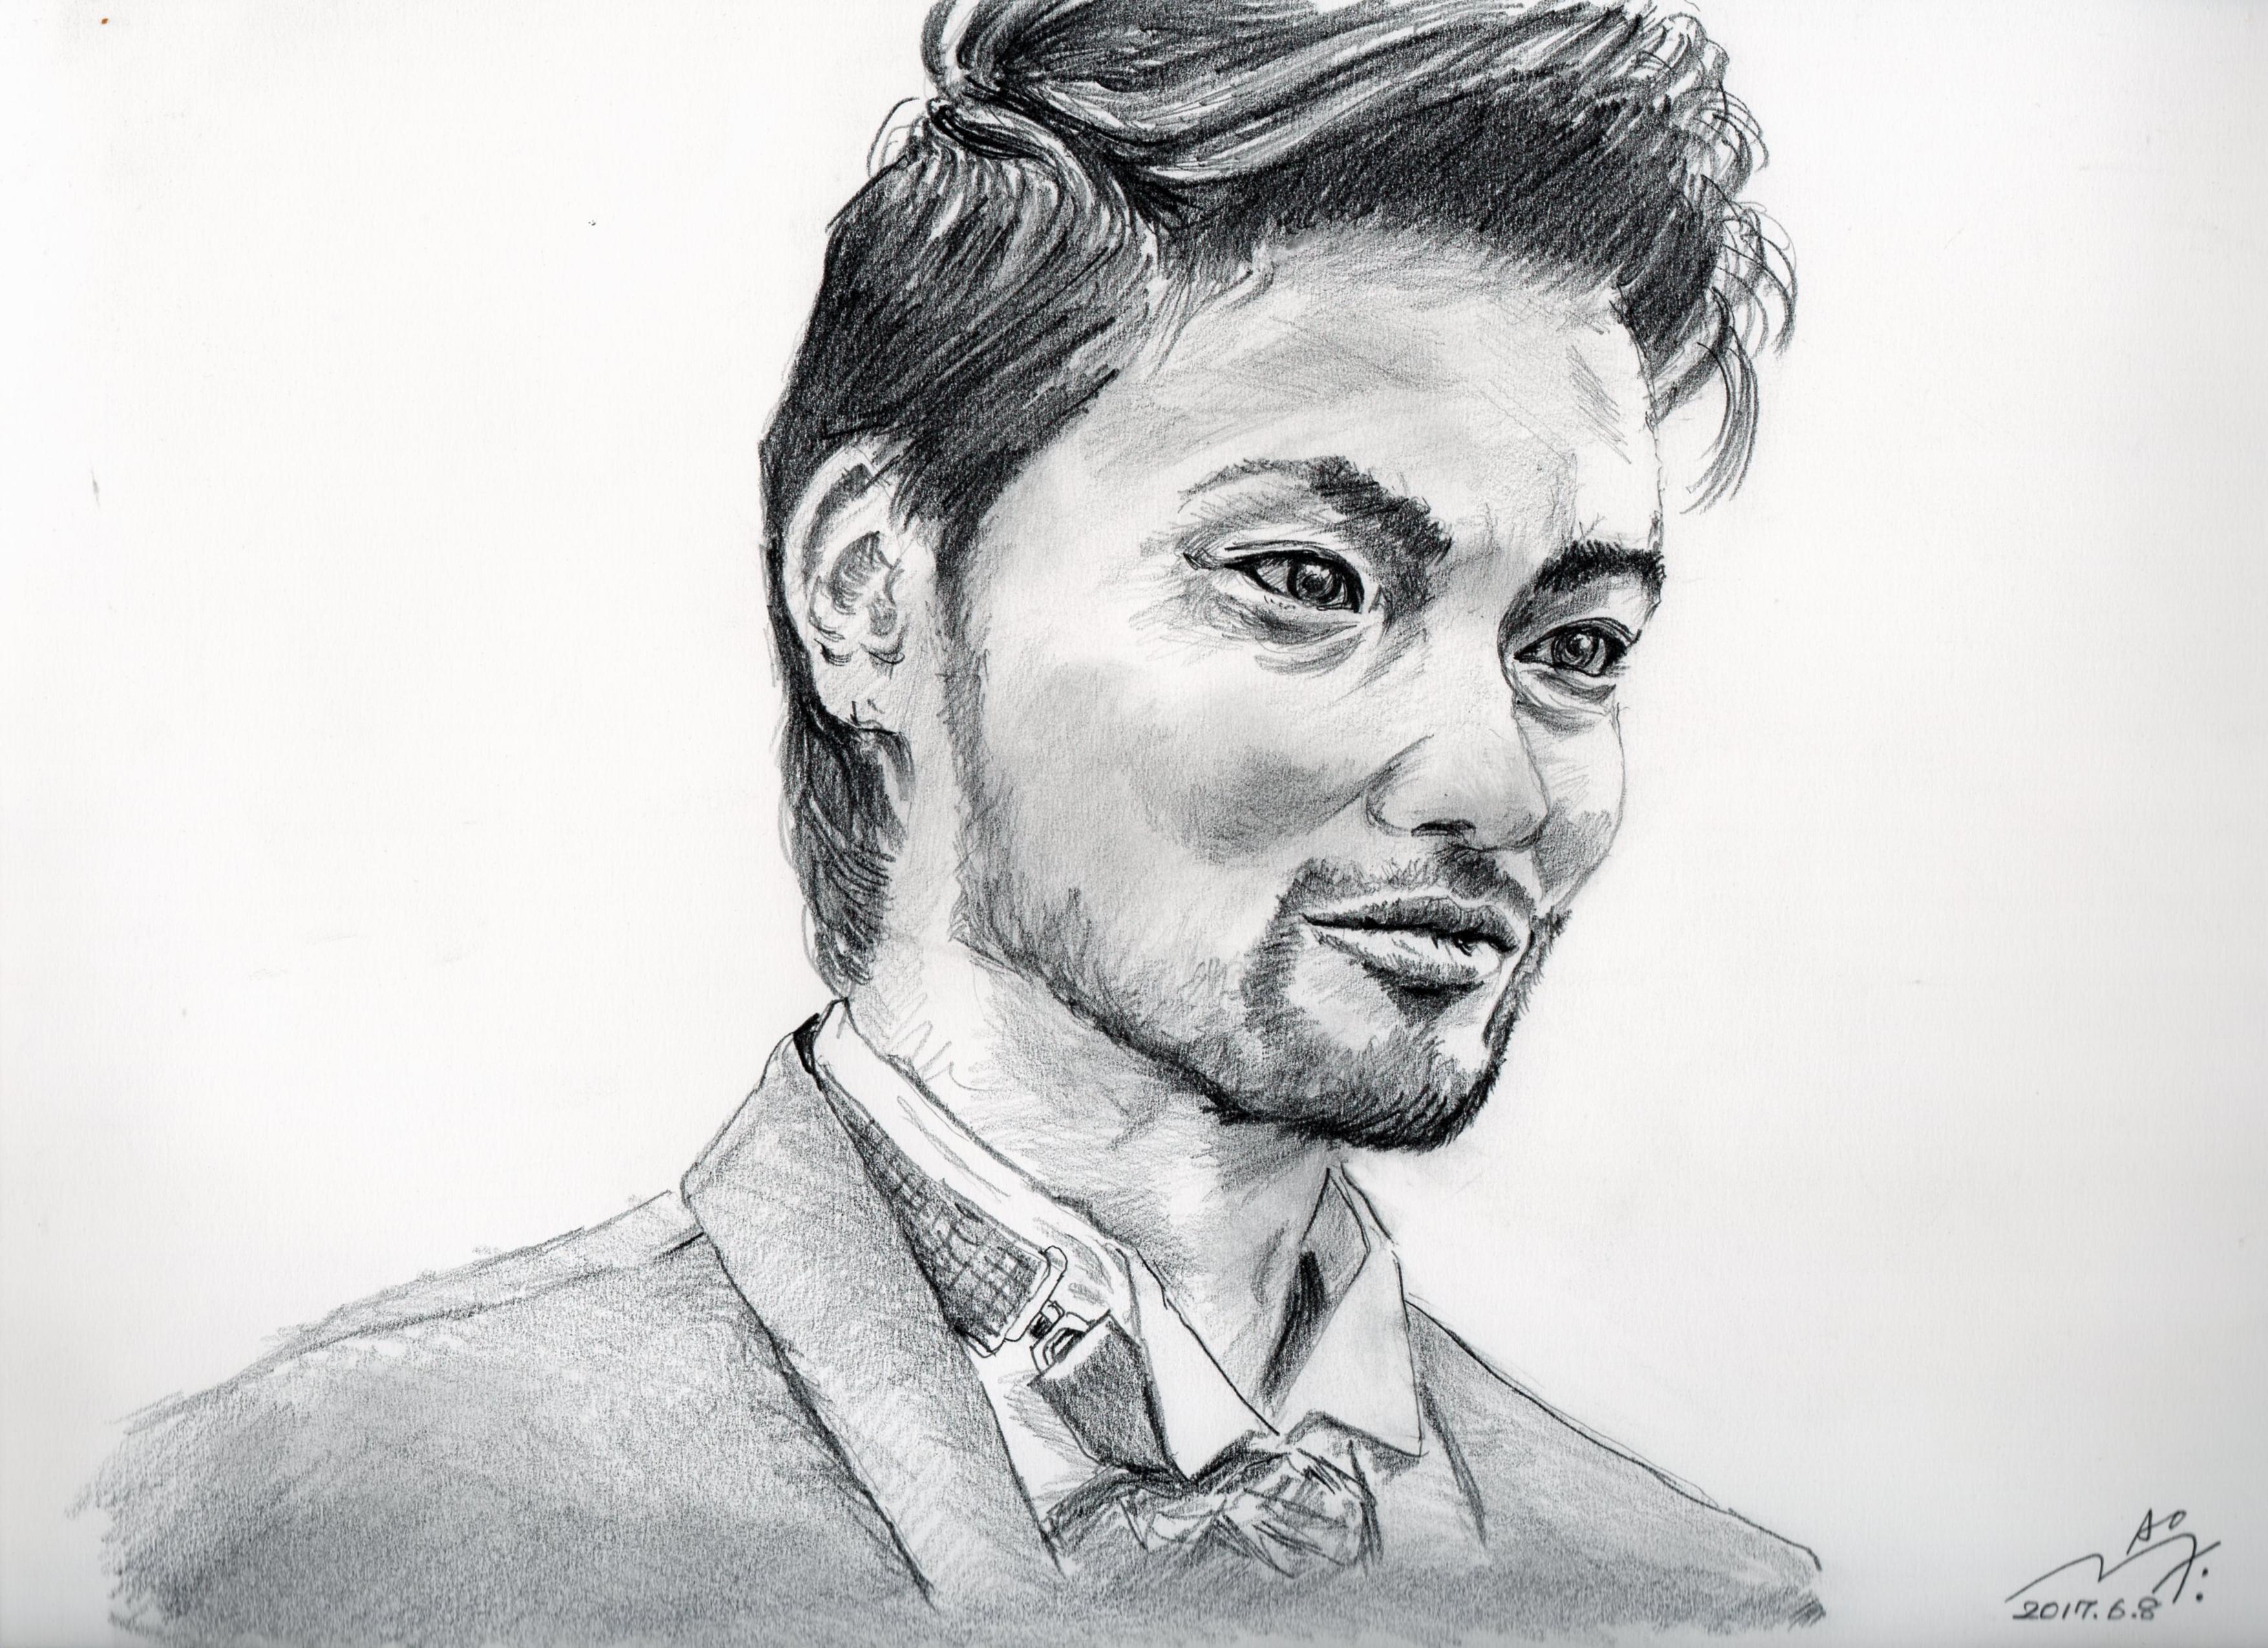 山田孝之の鉛筆画似顔絵